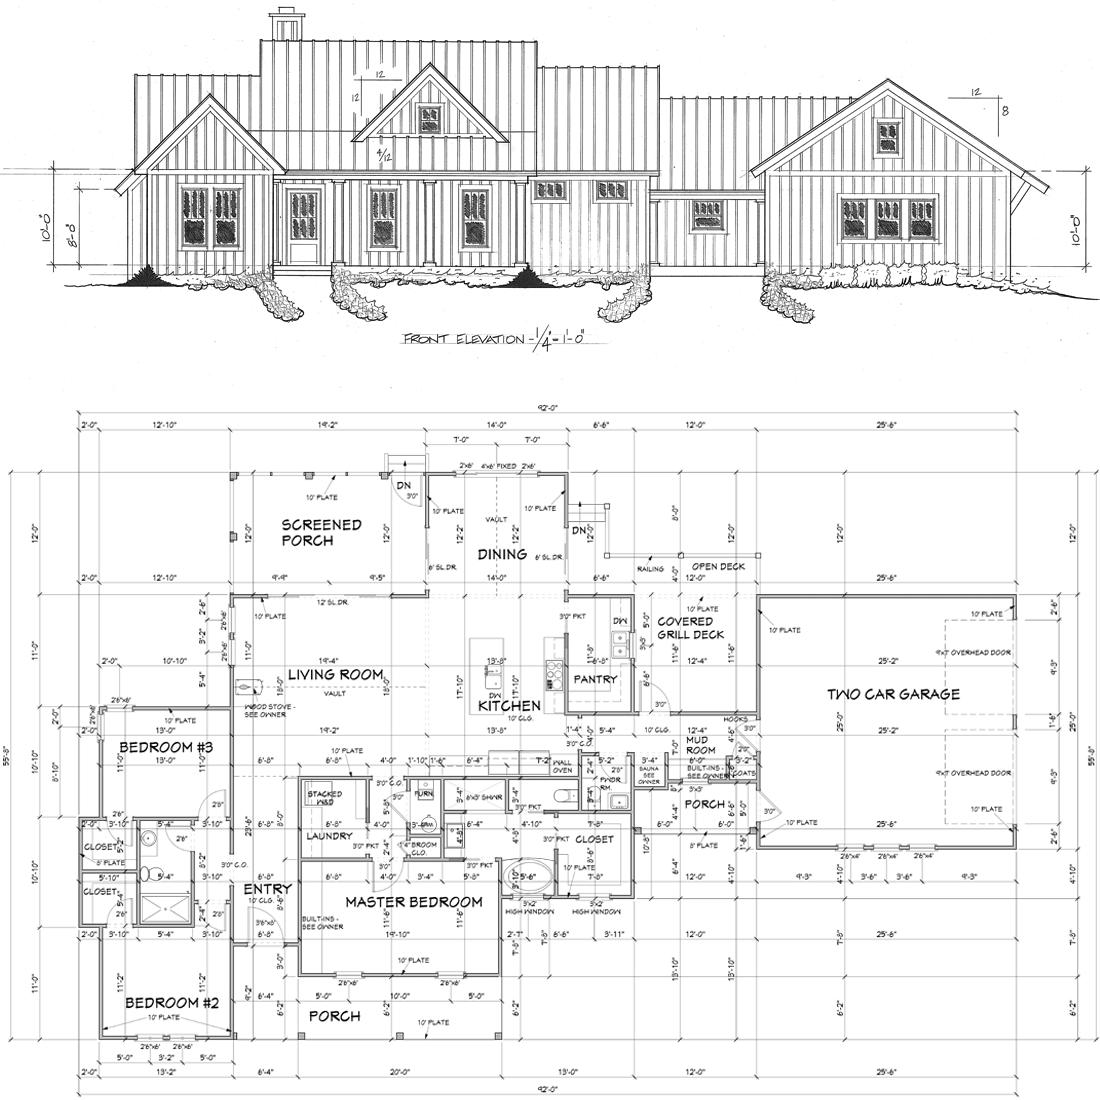 Floor plans of a modern farmhouse in southwest Missouri